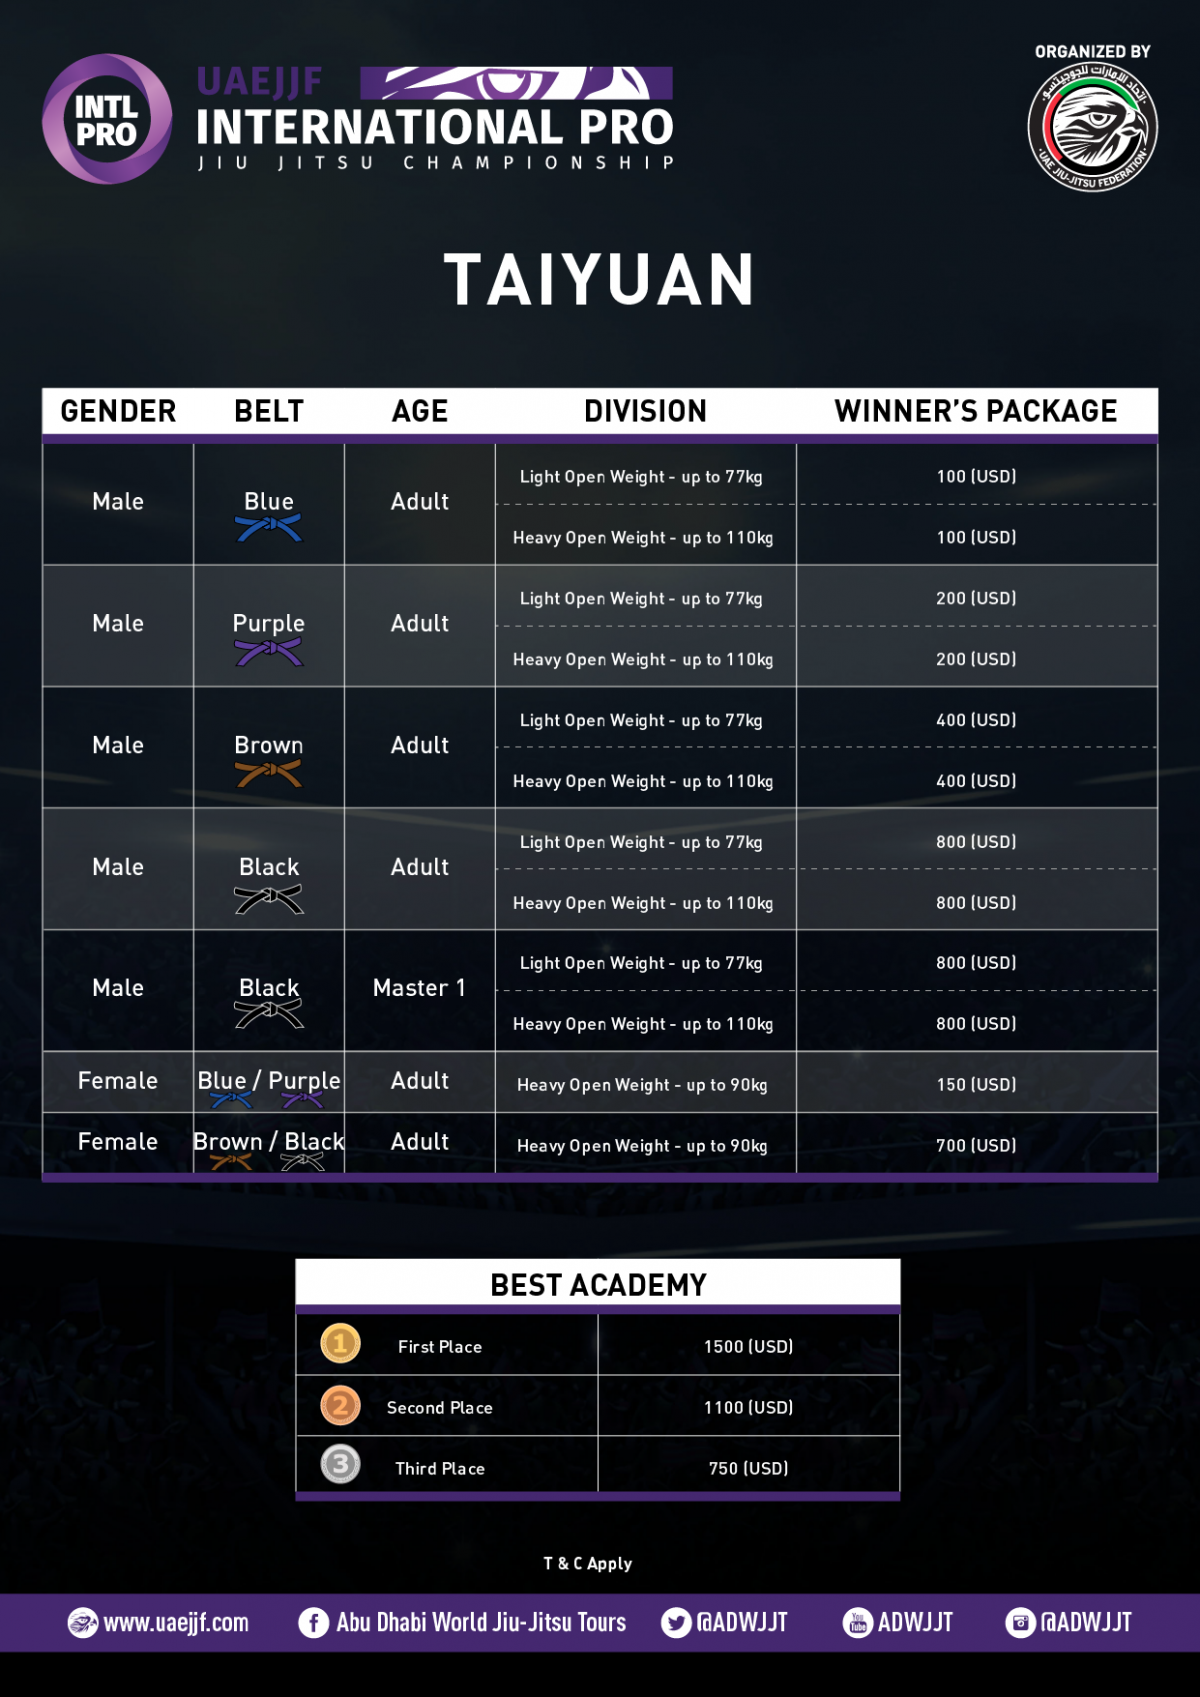 uae-jiu-jitsu-federation-taiyuan-international-pro-jiu-jitsu-championship-prizes-20180711062252.png